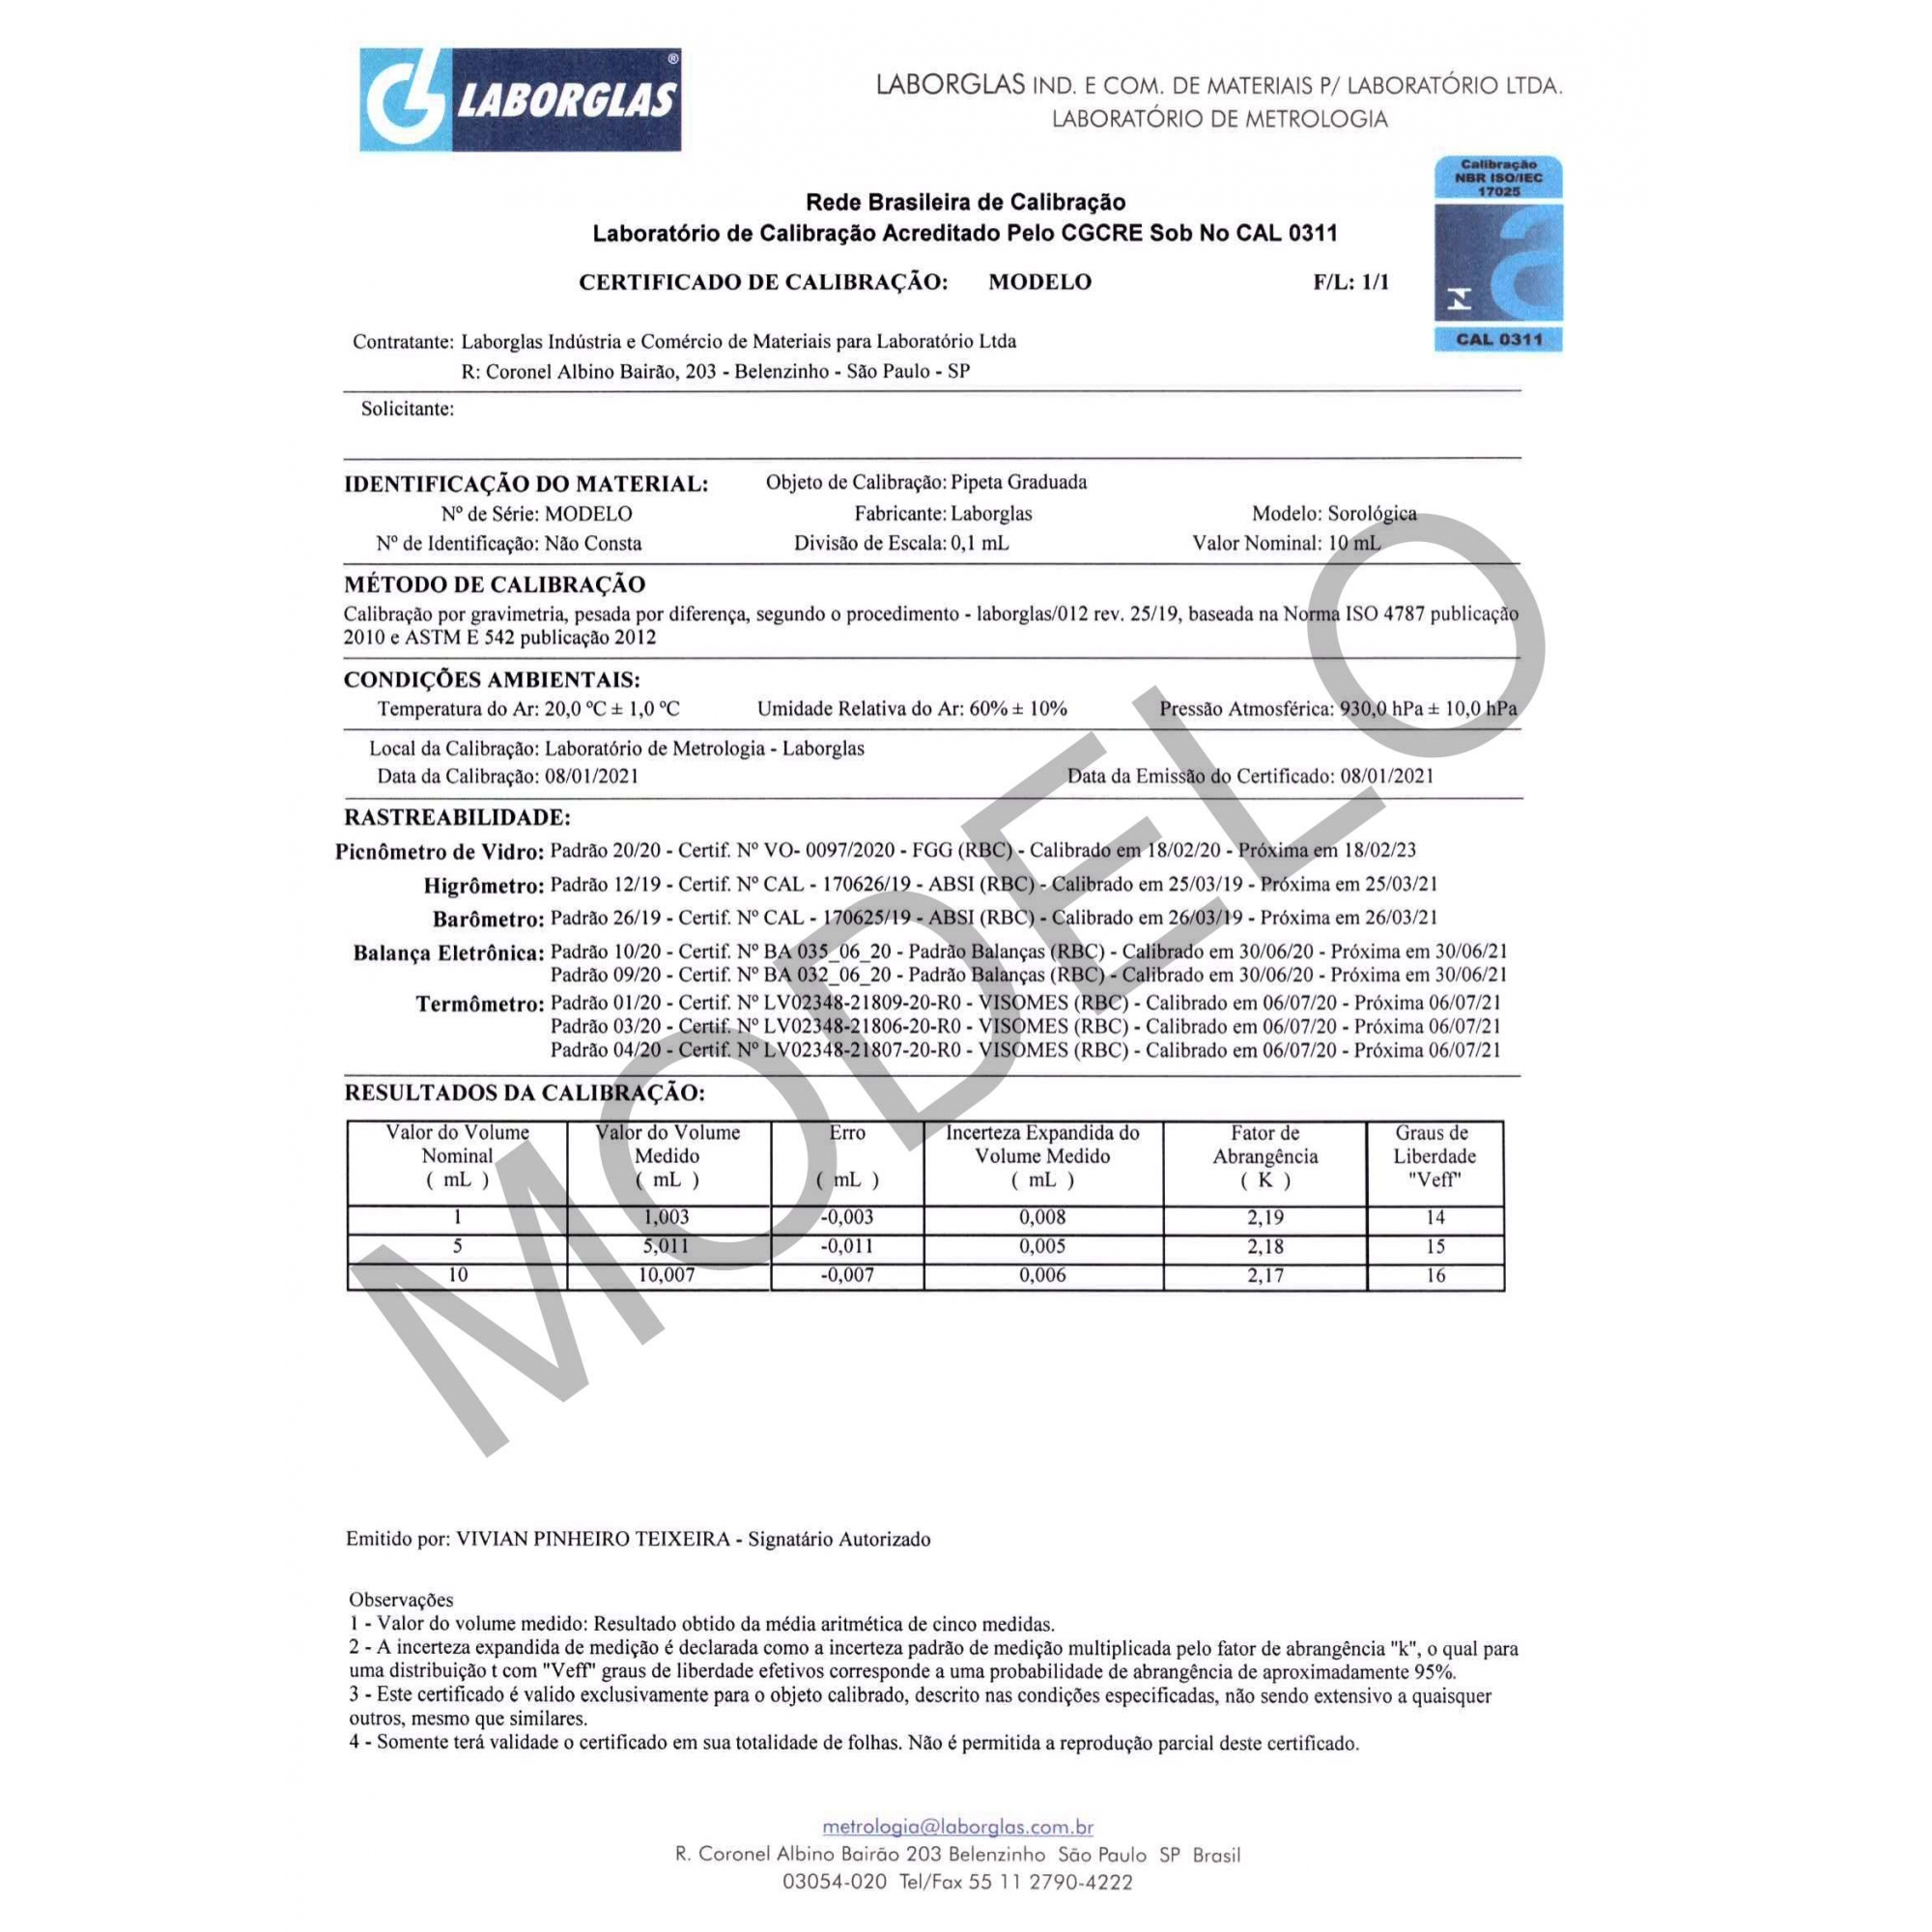 PIPETA GRAD. SOROL. ESGOT. TOTAL 2 ML 1/10 COM CERTIFICADO RBC - Laborglas - Cód. 9434308-R